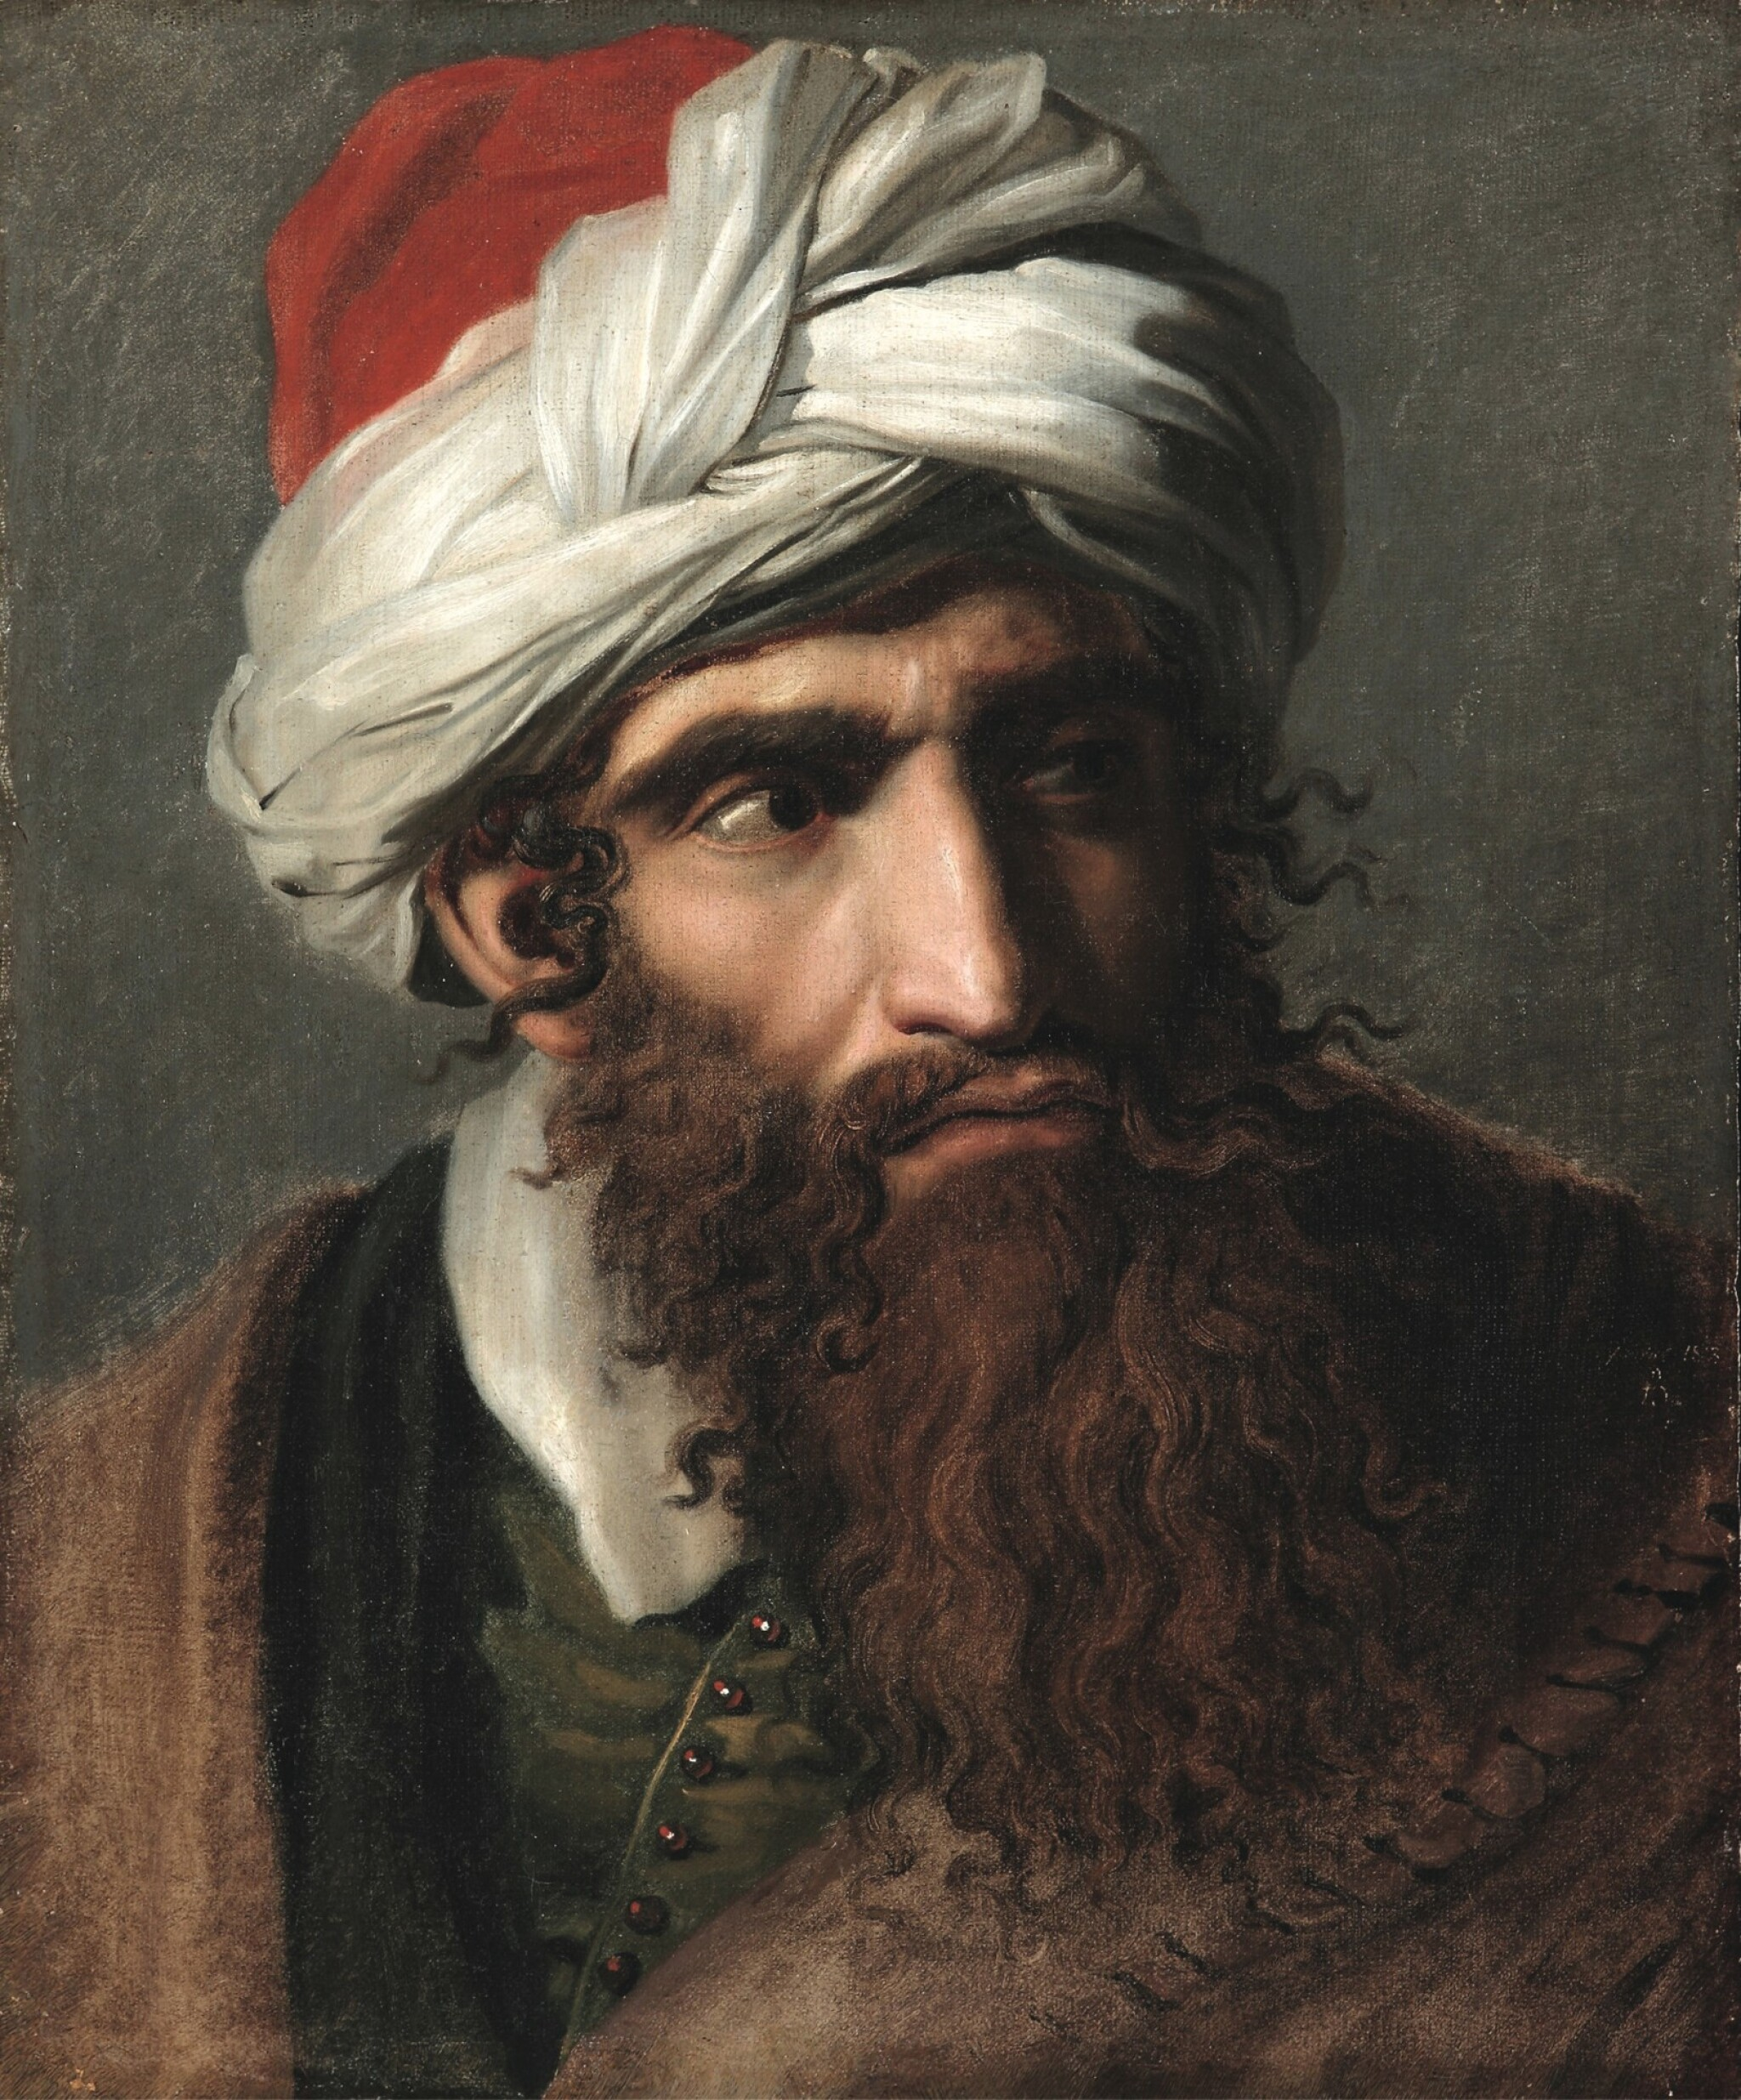 View 1 of Lot 109. PIERRE-NOLASQUE BERGERET  |  PORTRAIT OF A MAN IN A TURBAN, THREE-QUARTER PROFILE.